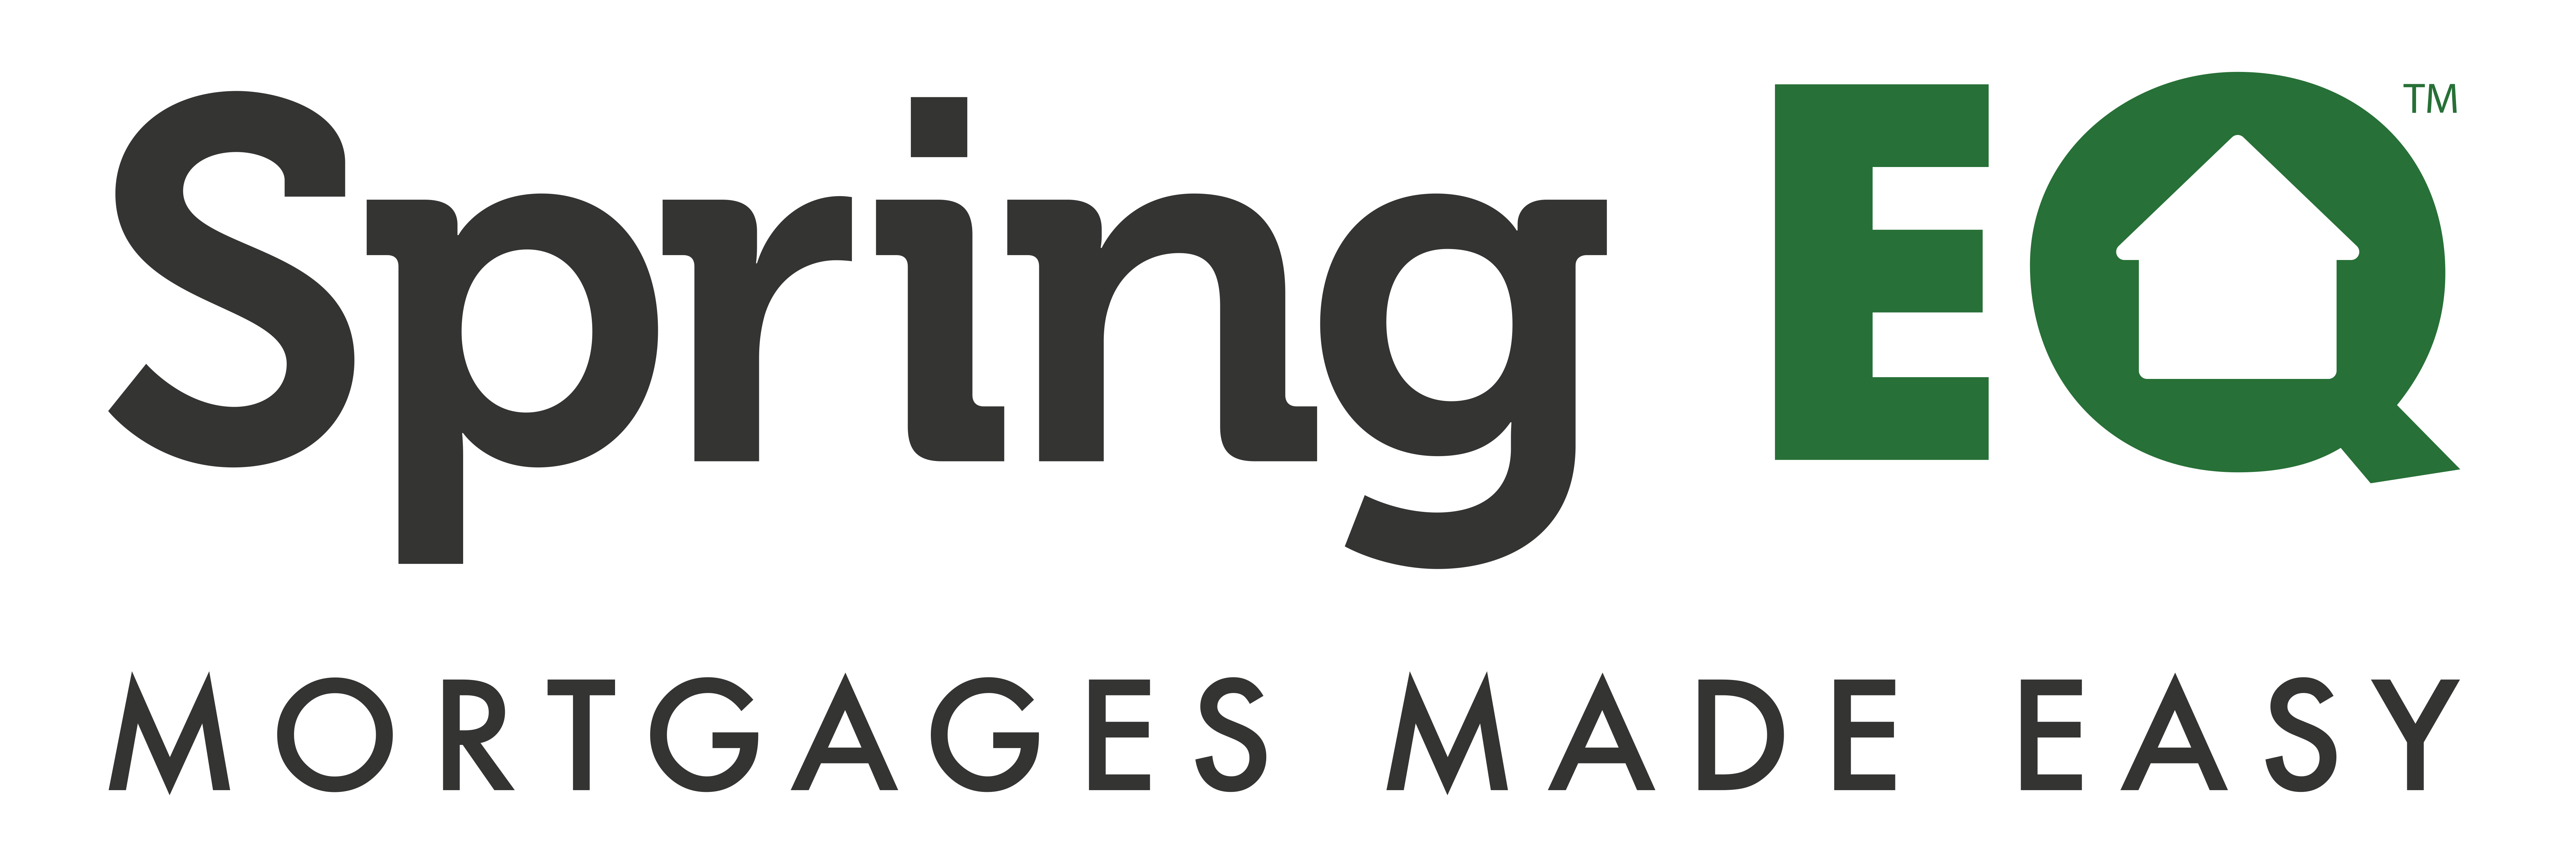 SEQ Mortgages made easy Logo